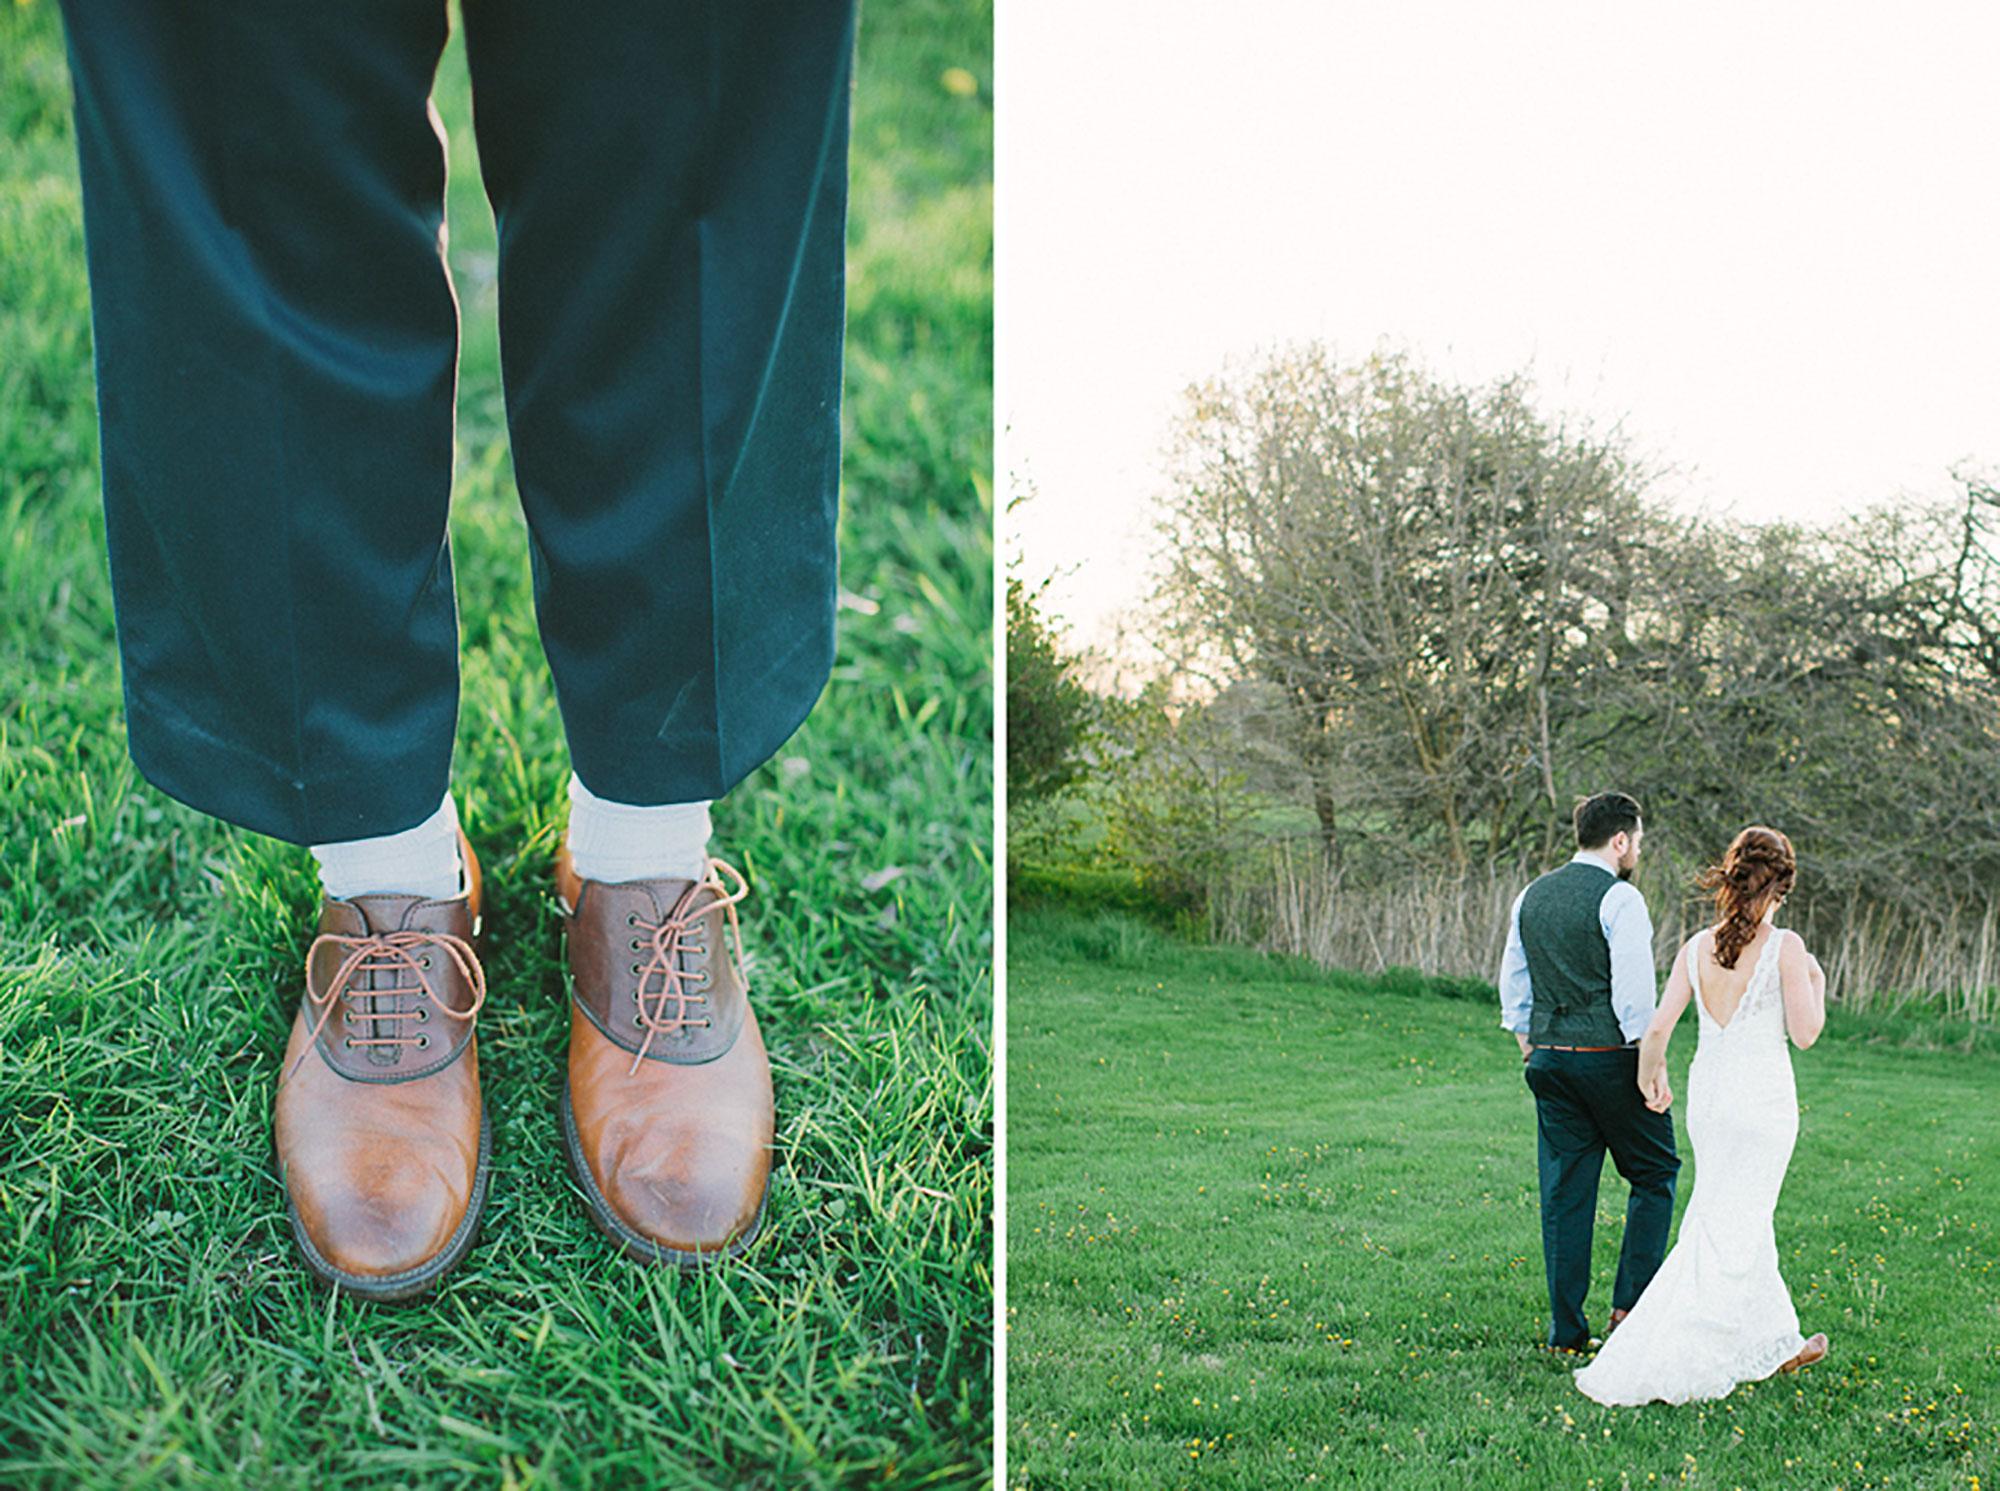 Navy-Hall-Wedding-Vineyard-Bride-Photo-By-Andrew-Mark-Photography-050.jpg